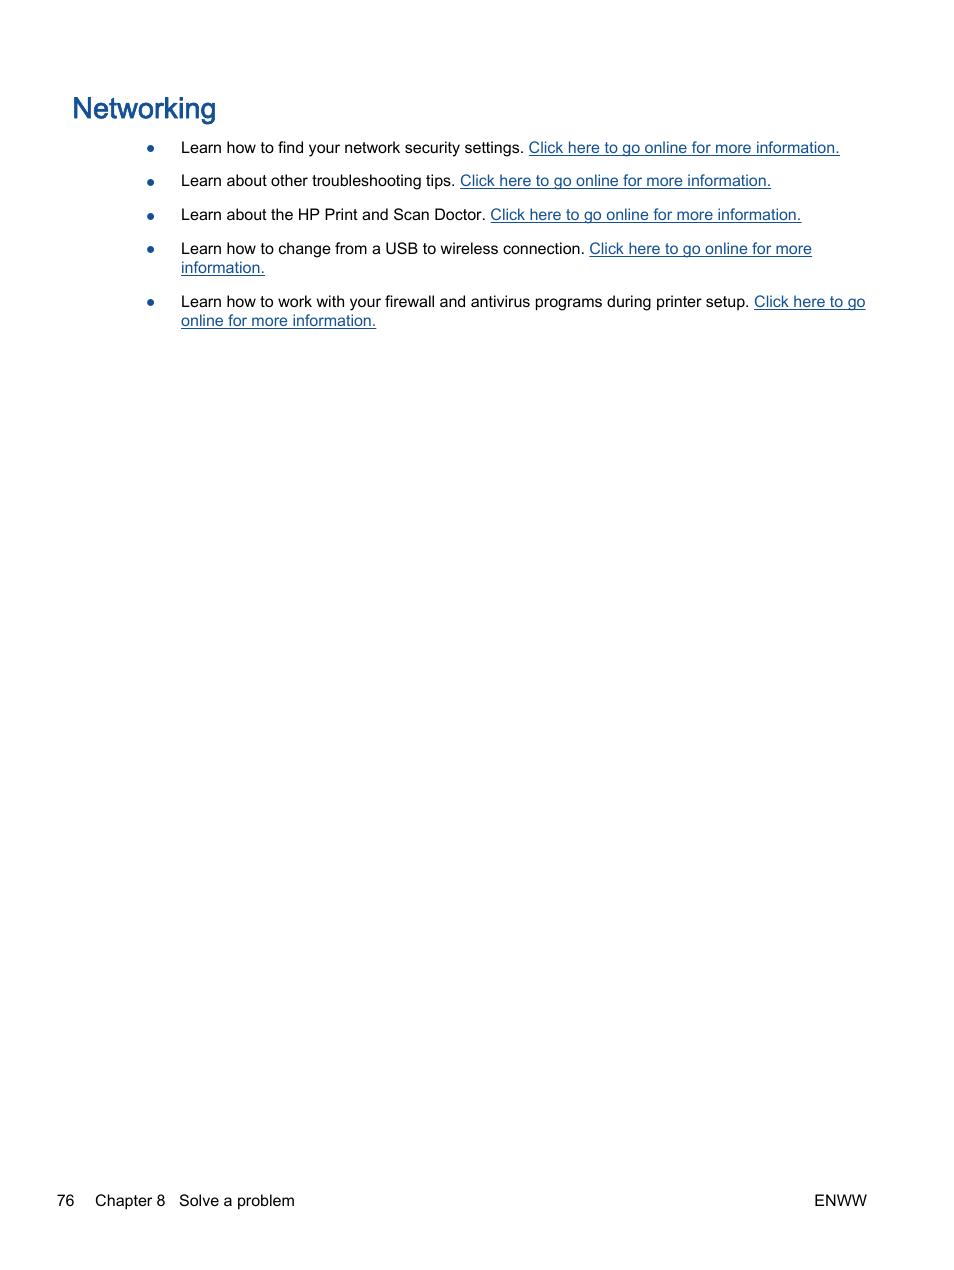 Networking | HP Deskjet 2540 All-in-One Printer User Manual